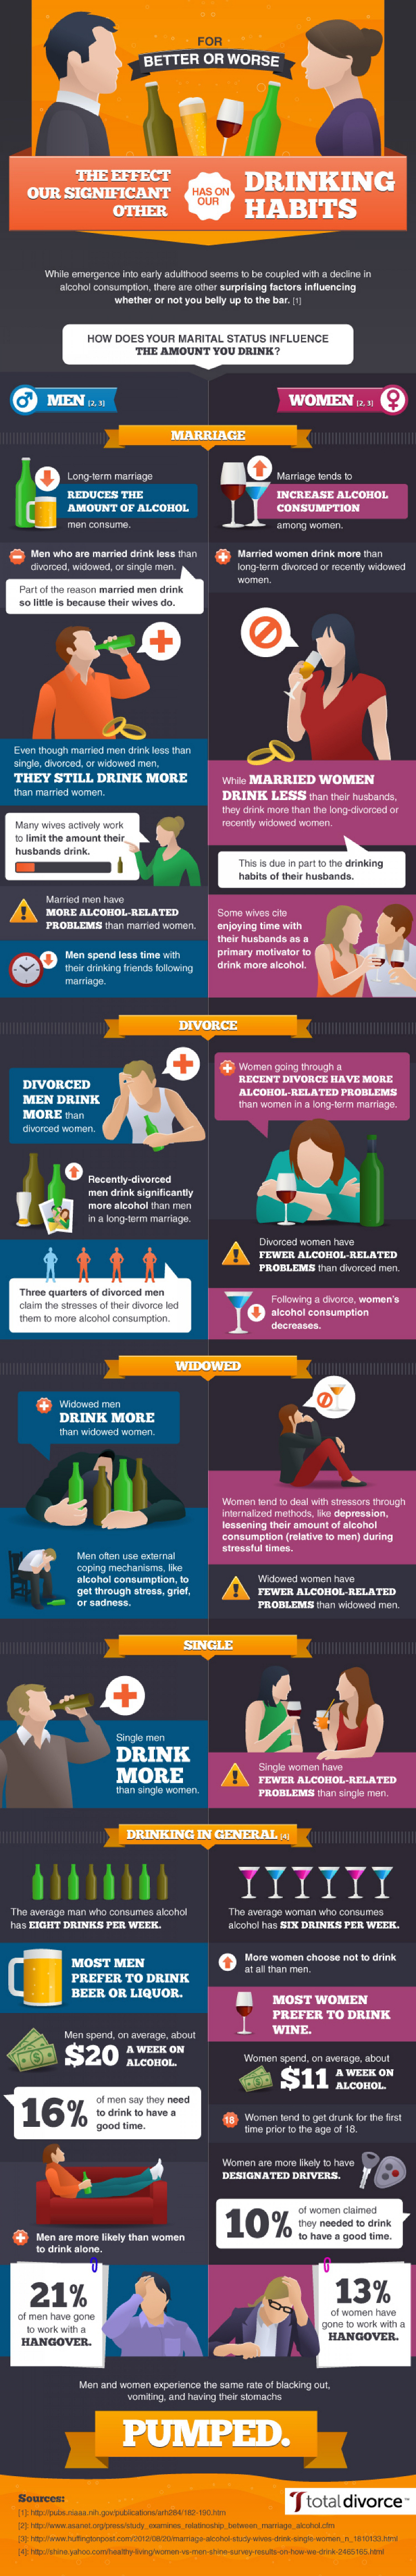 Relationship-Status-on-Drinking